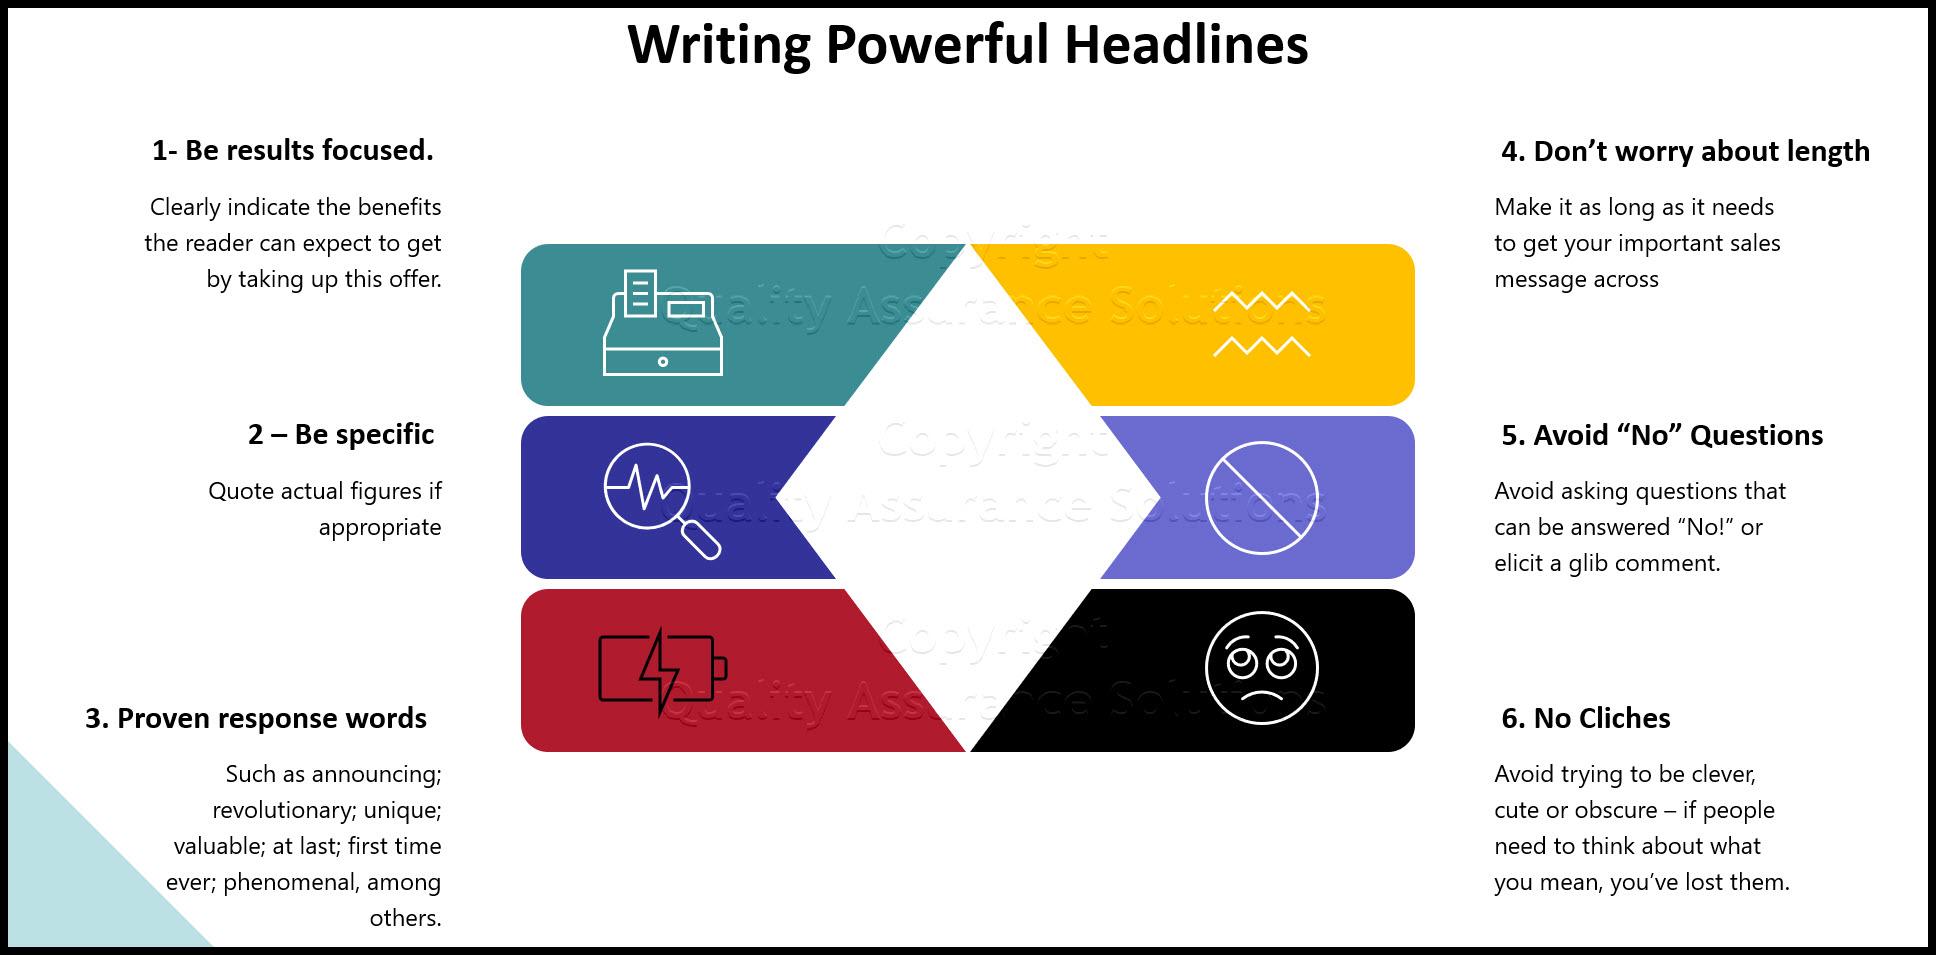 writing powerful headlines business slide